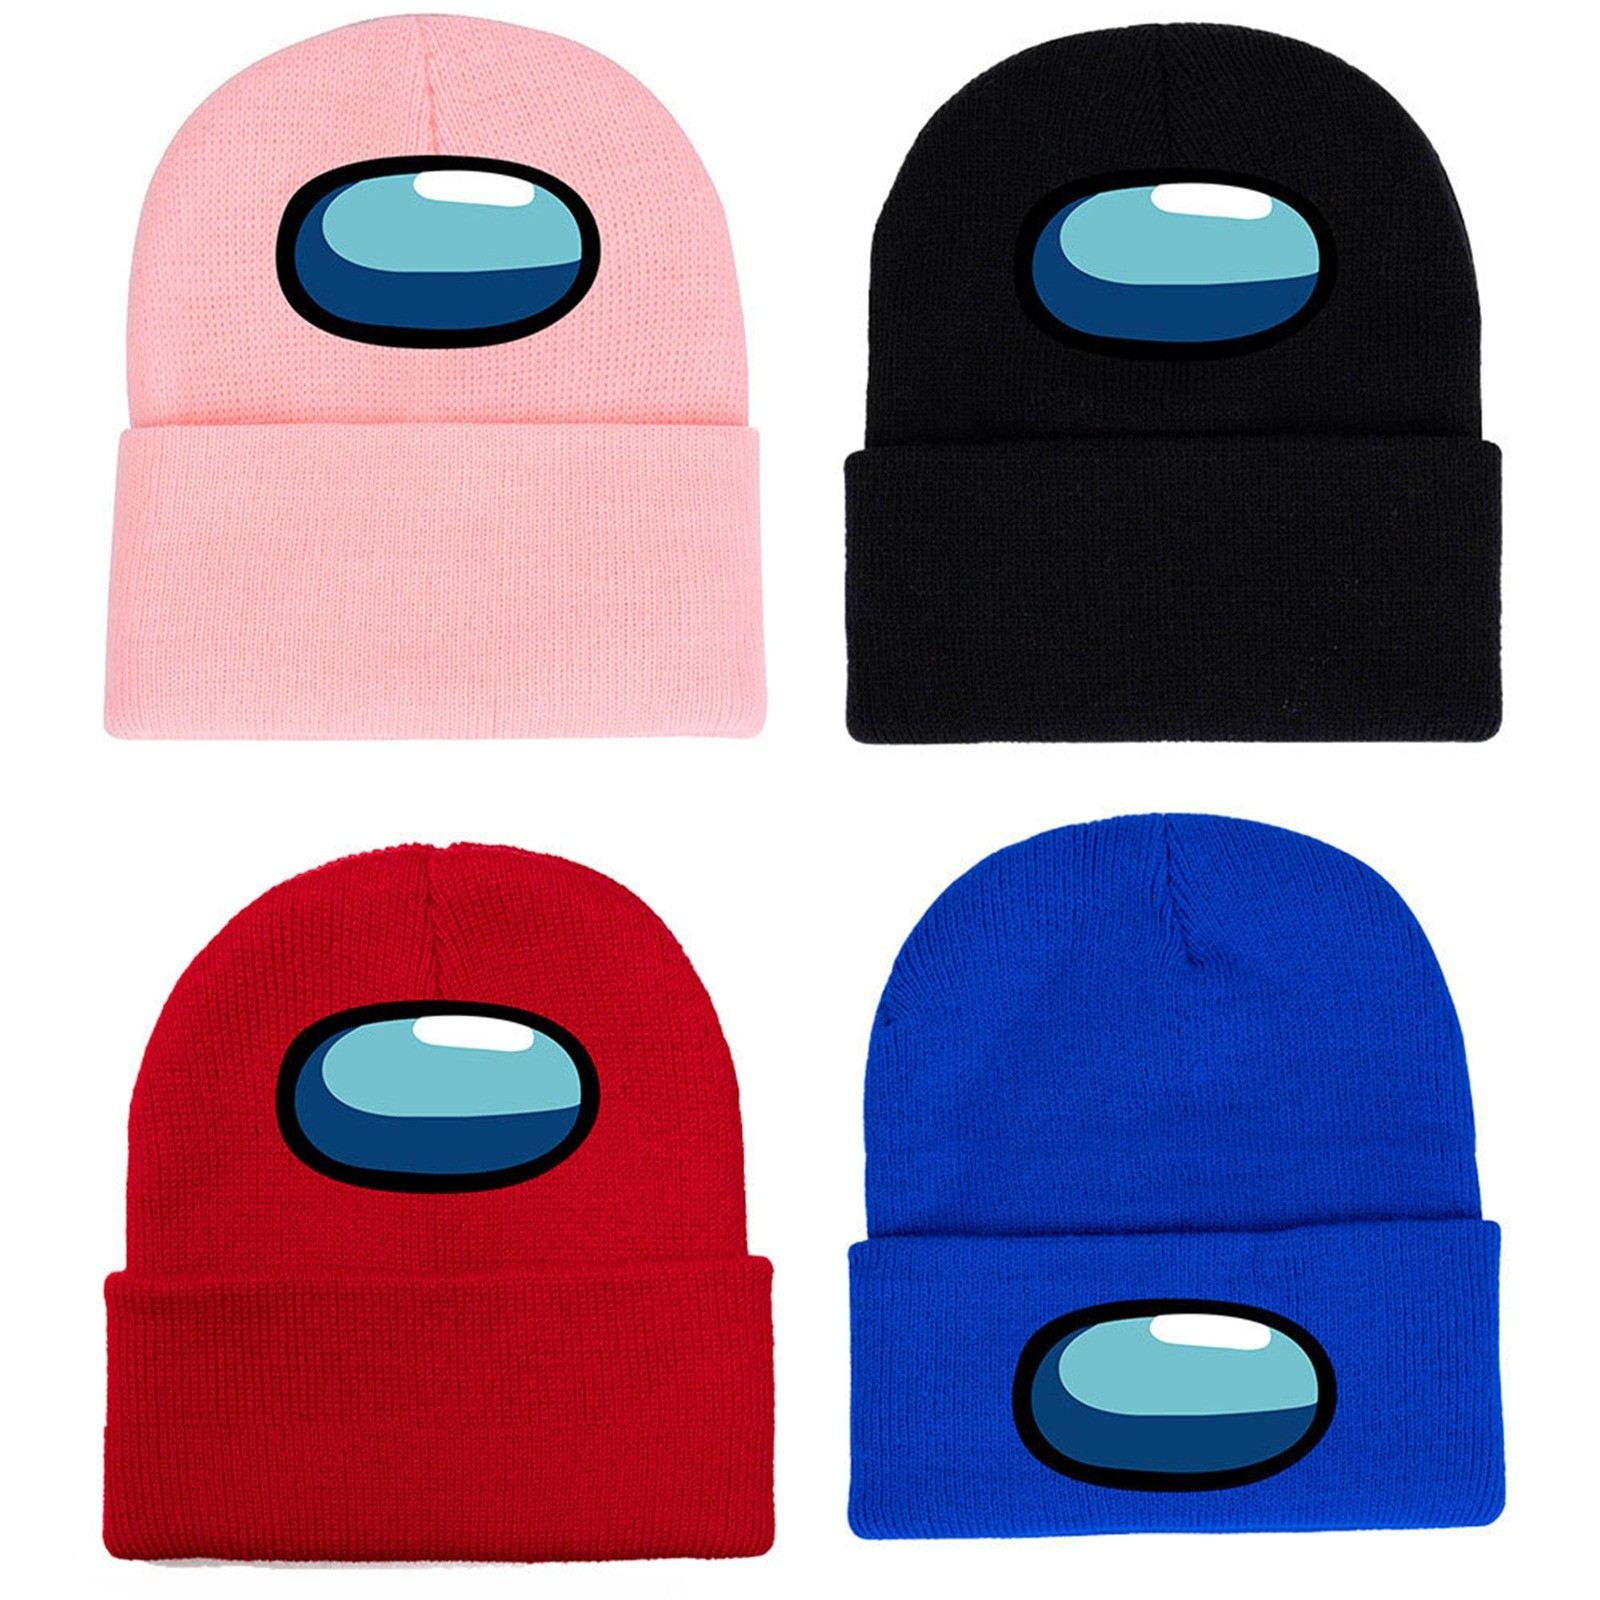 Tapas de juego caliente entre nosotros de punto de invierno sombrero de modelo tapas juego gorro de Hip Hop mantener caliente regalo algodón sombrero gorros de esquí para niños